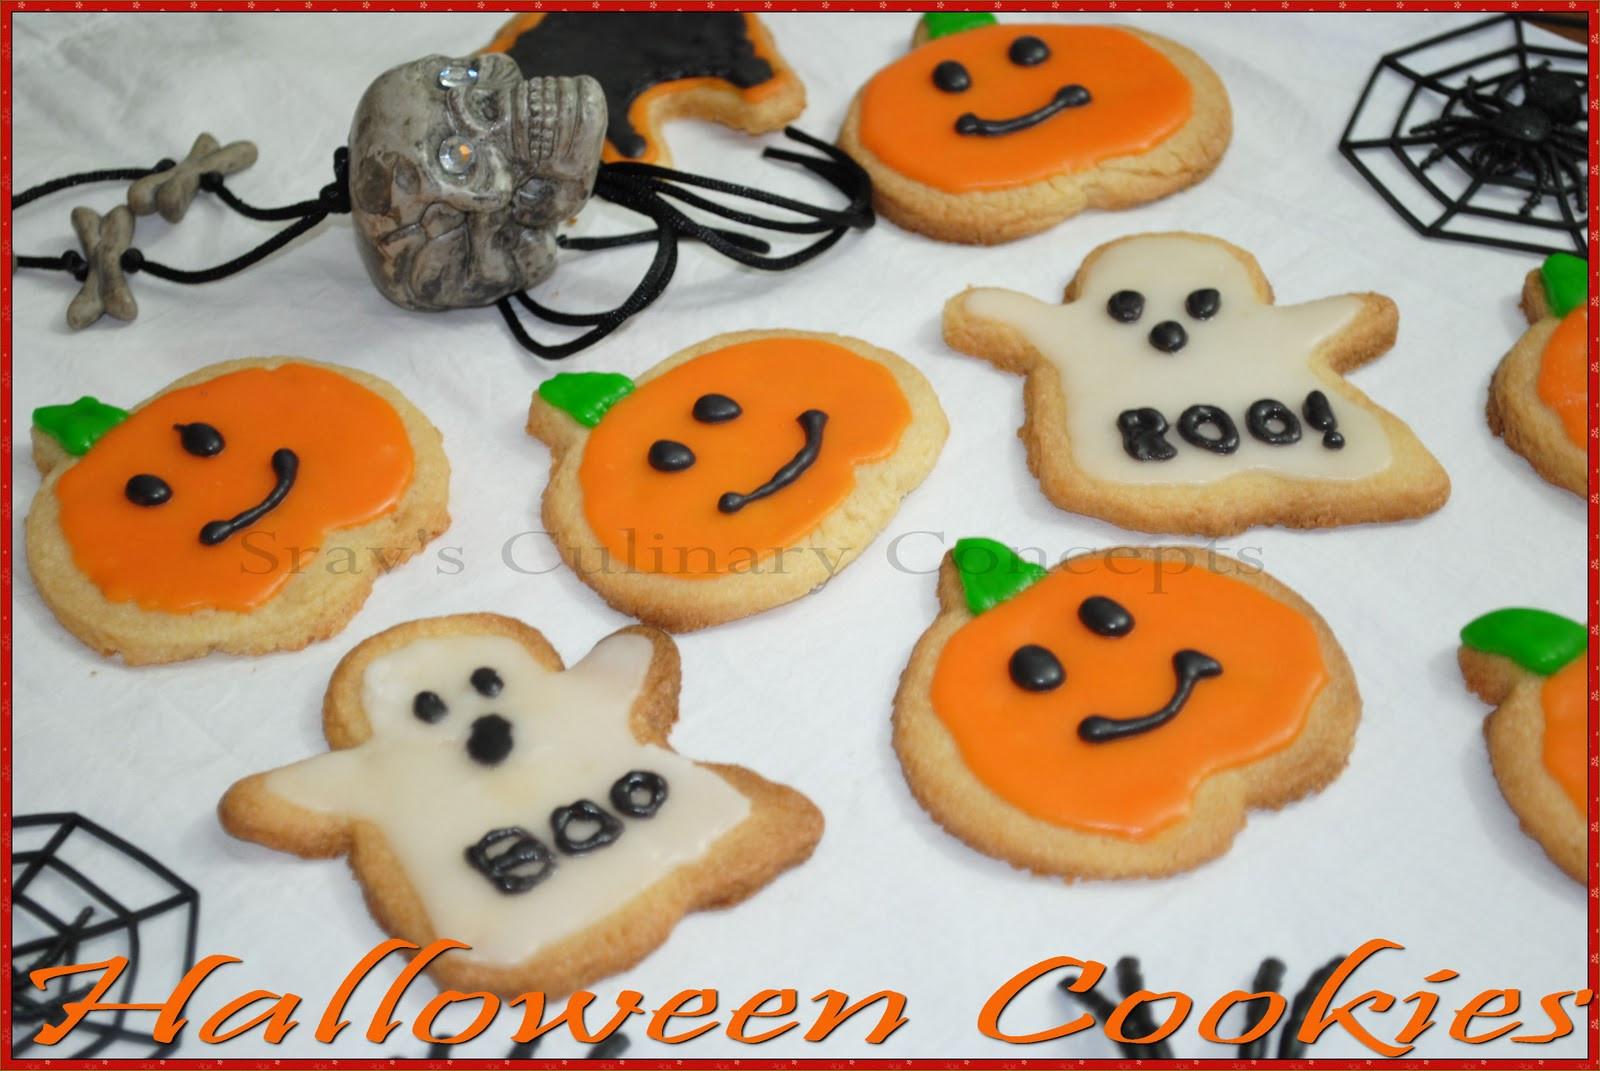 Halloween Sugar Cookies Recipes  Srav s Culinary Concepts Halloween Sugar Cookies with